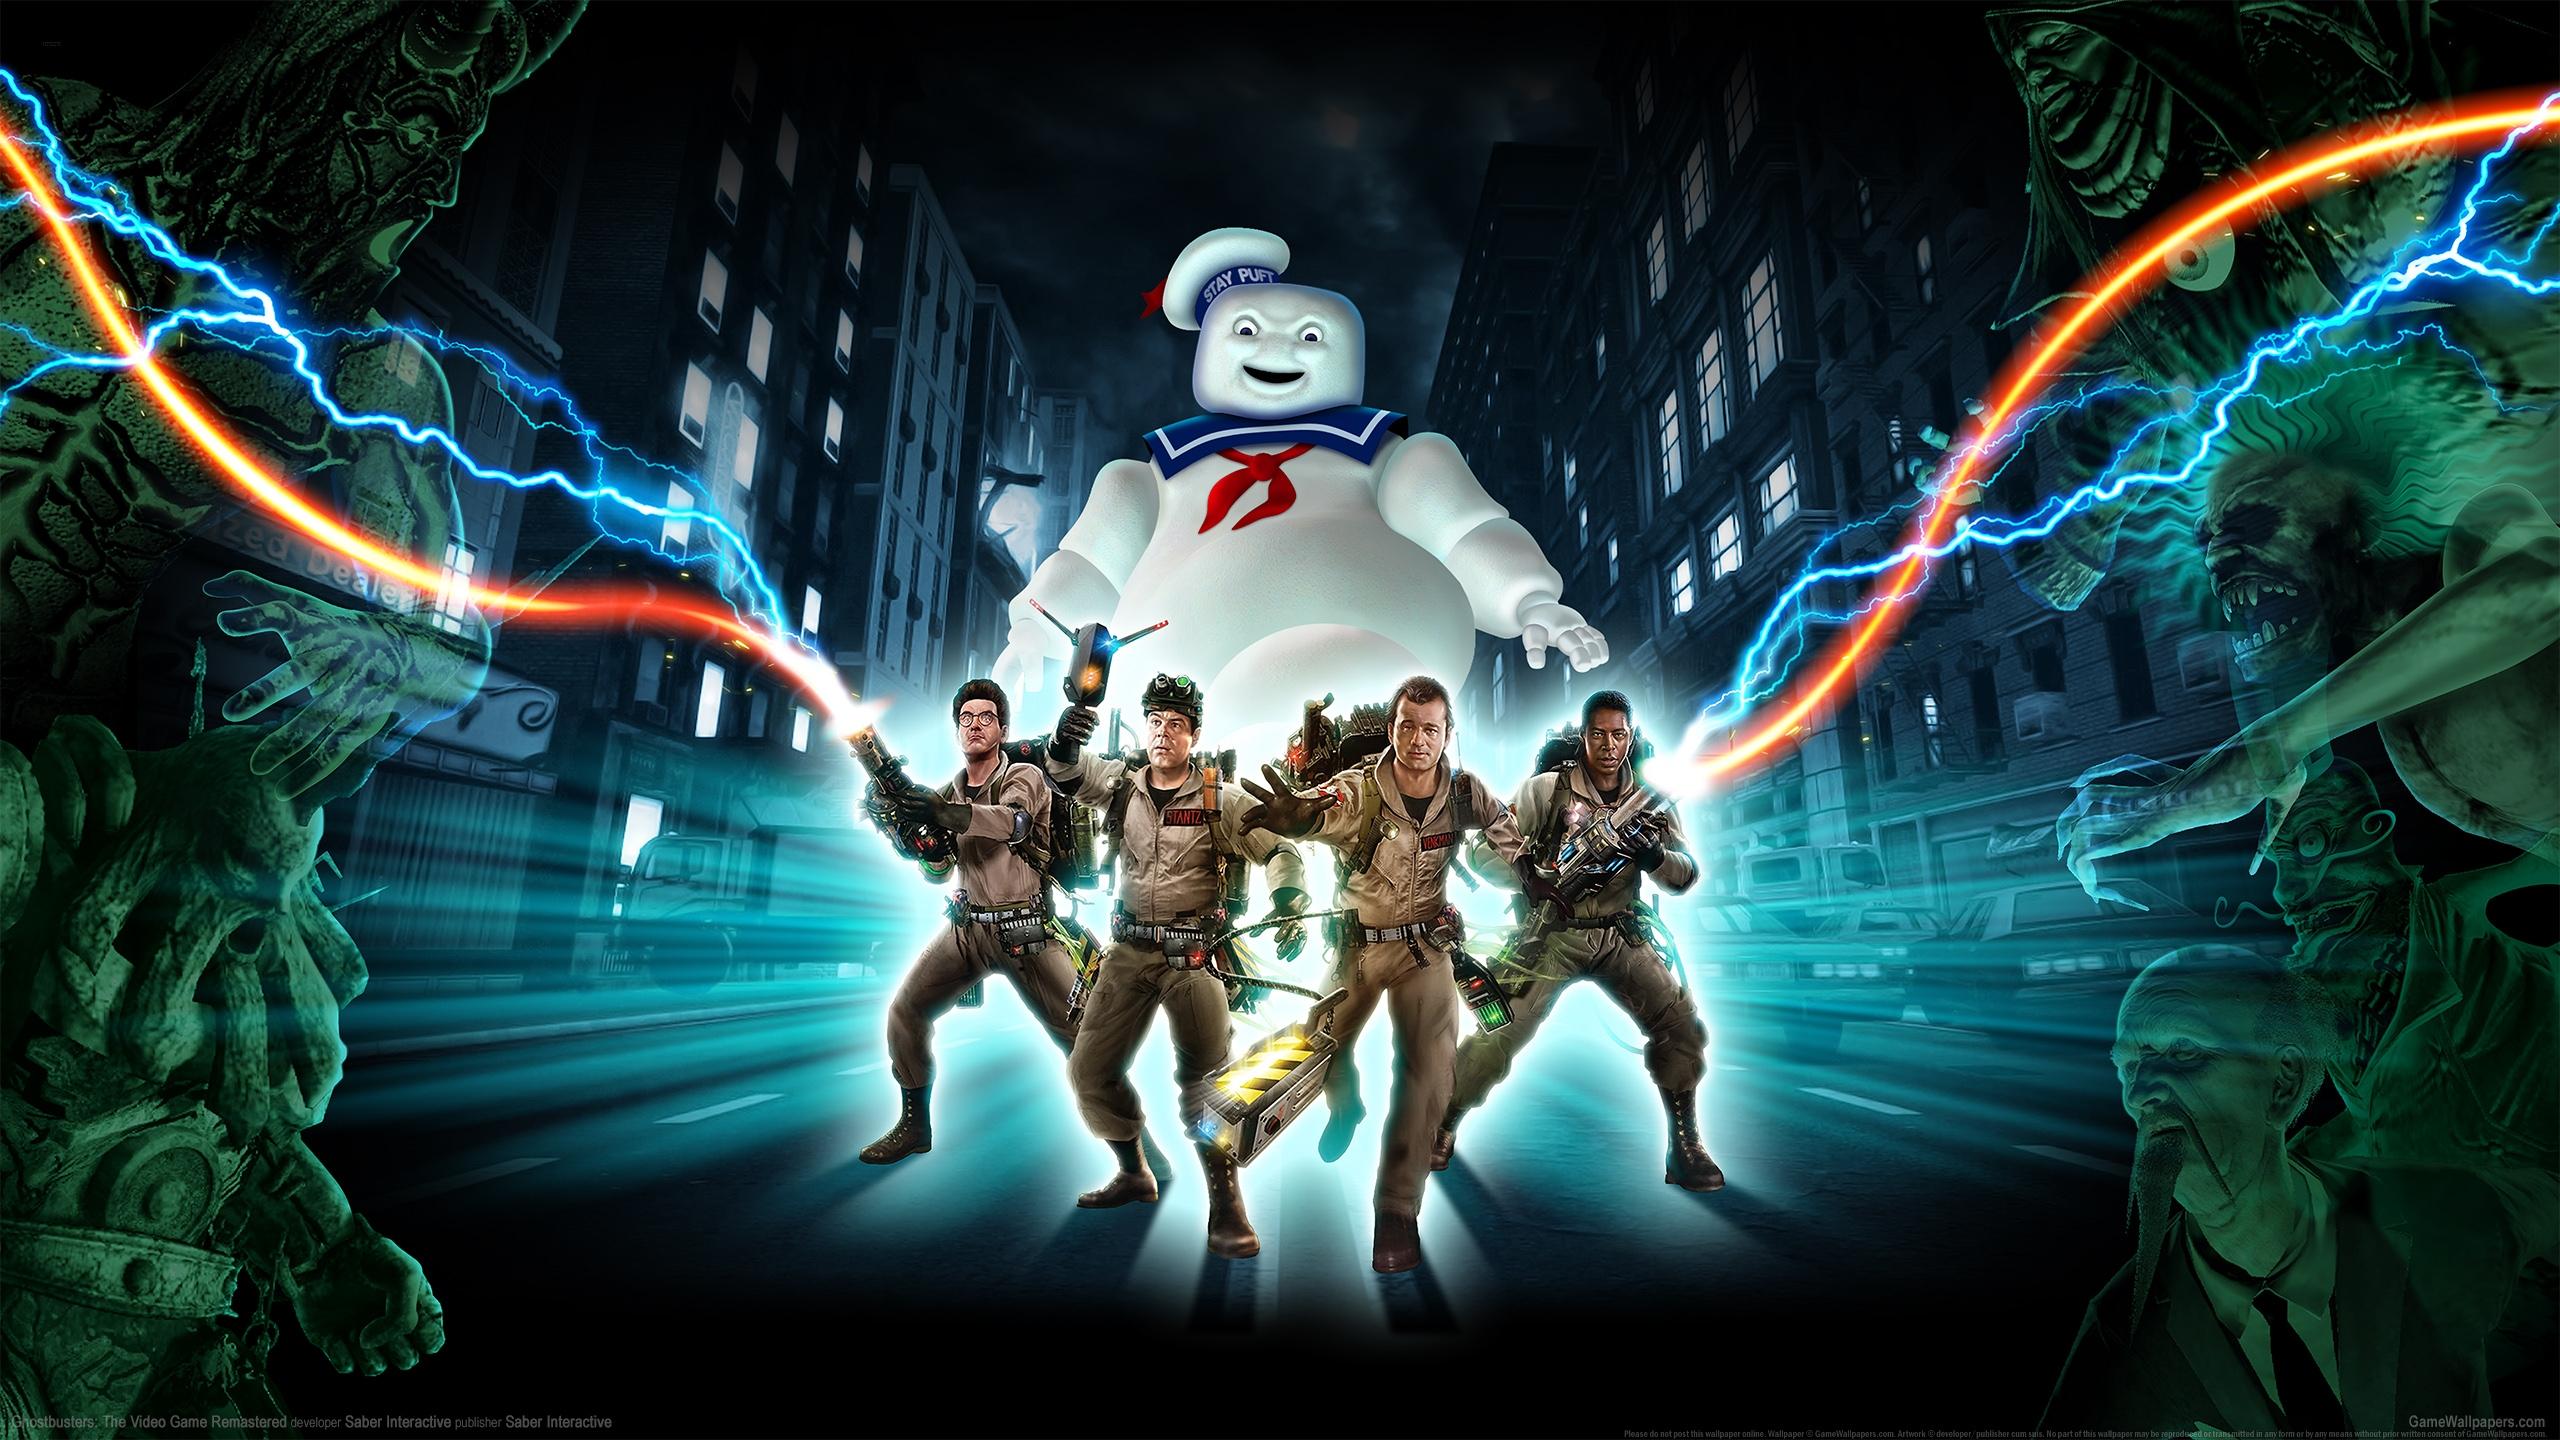 Ghostbusters: The Video Game Remastered 2560x1440 Hintergrundbild 01